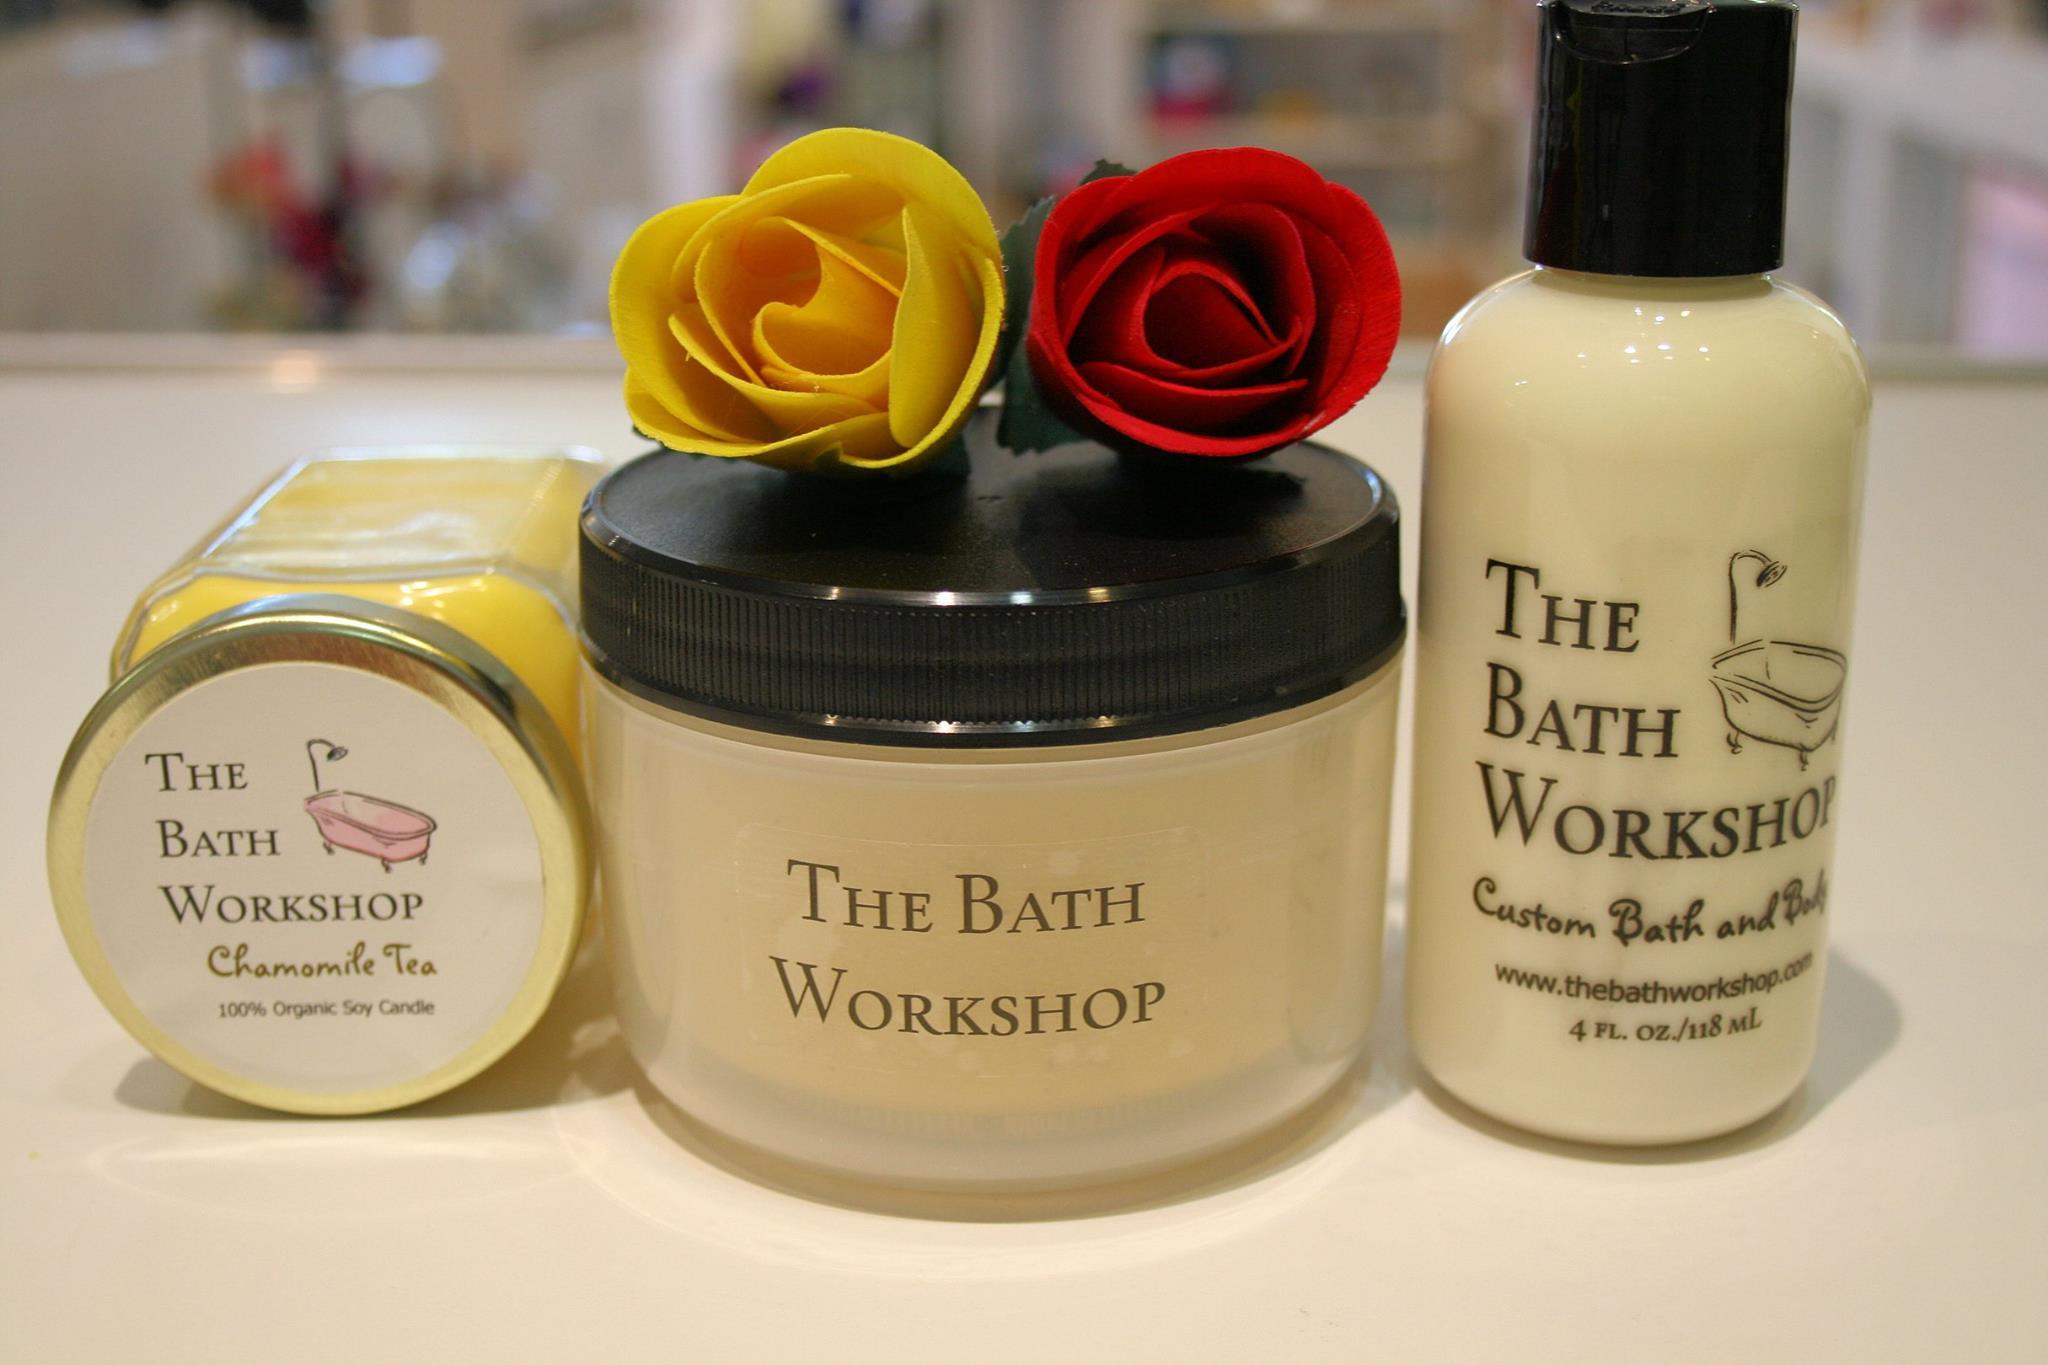 The Bath Workshop – Custom Bath & Body, Home & Pet